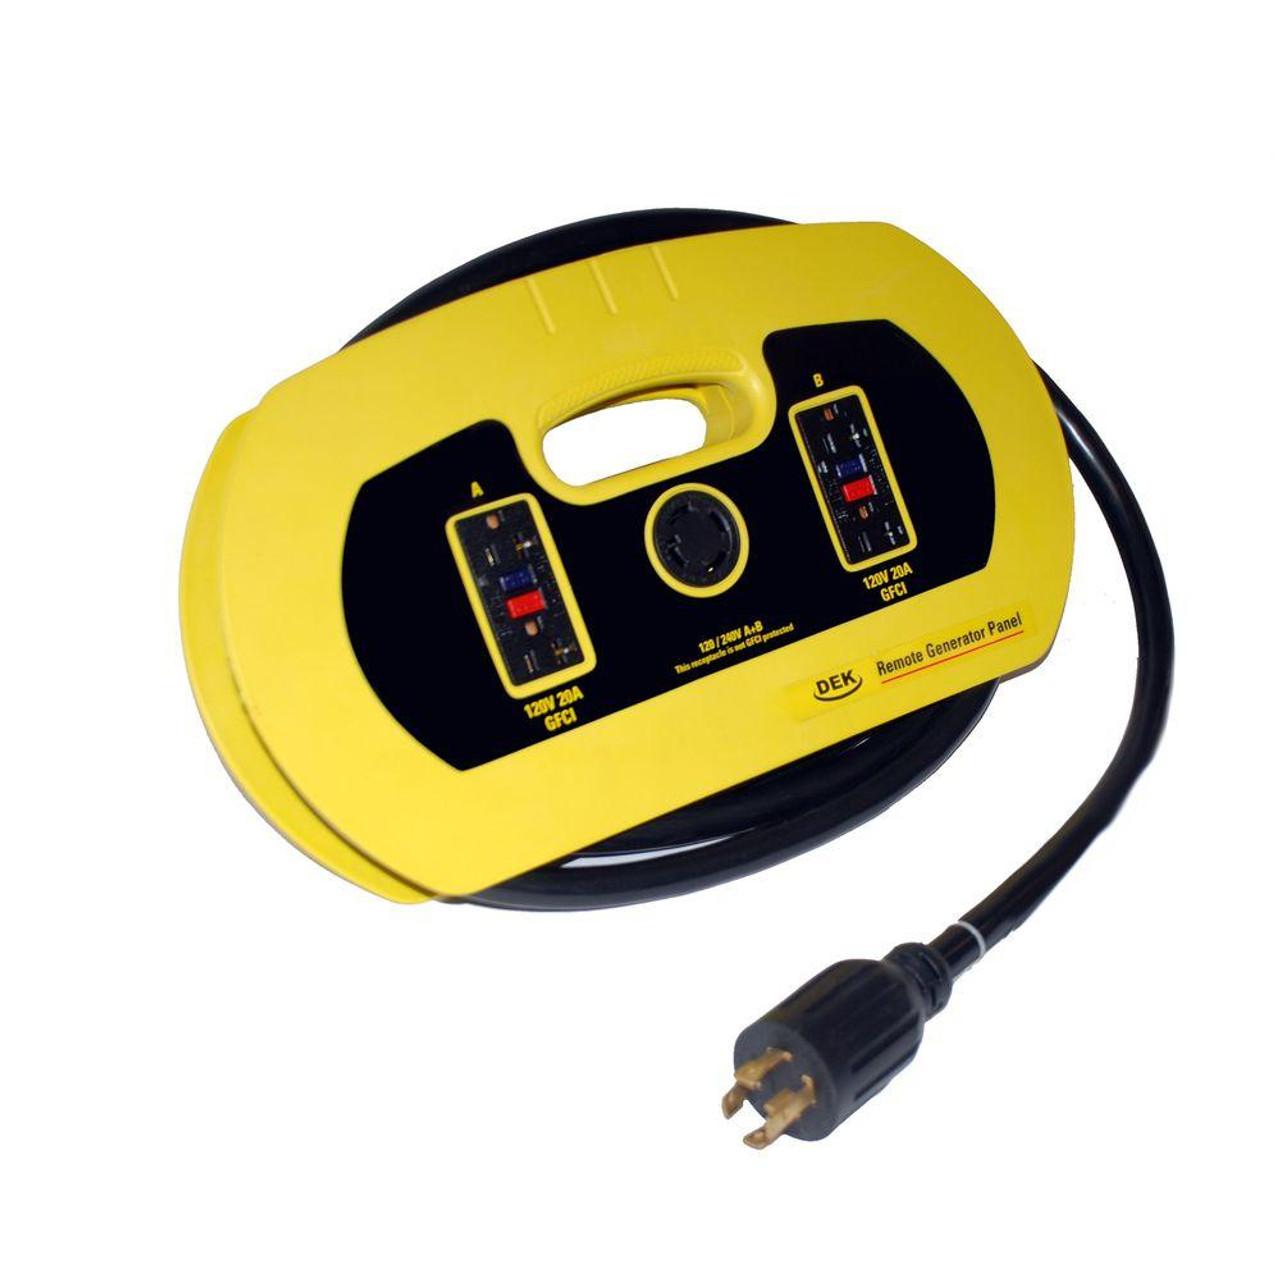 240v Extension Cord >> Dek Universal Generator 15 Cord W 120 Volt 240 Volt 30 Amp Plugs